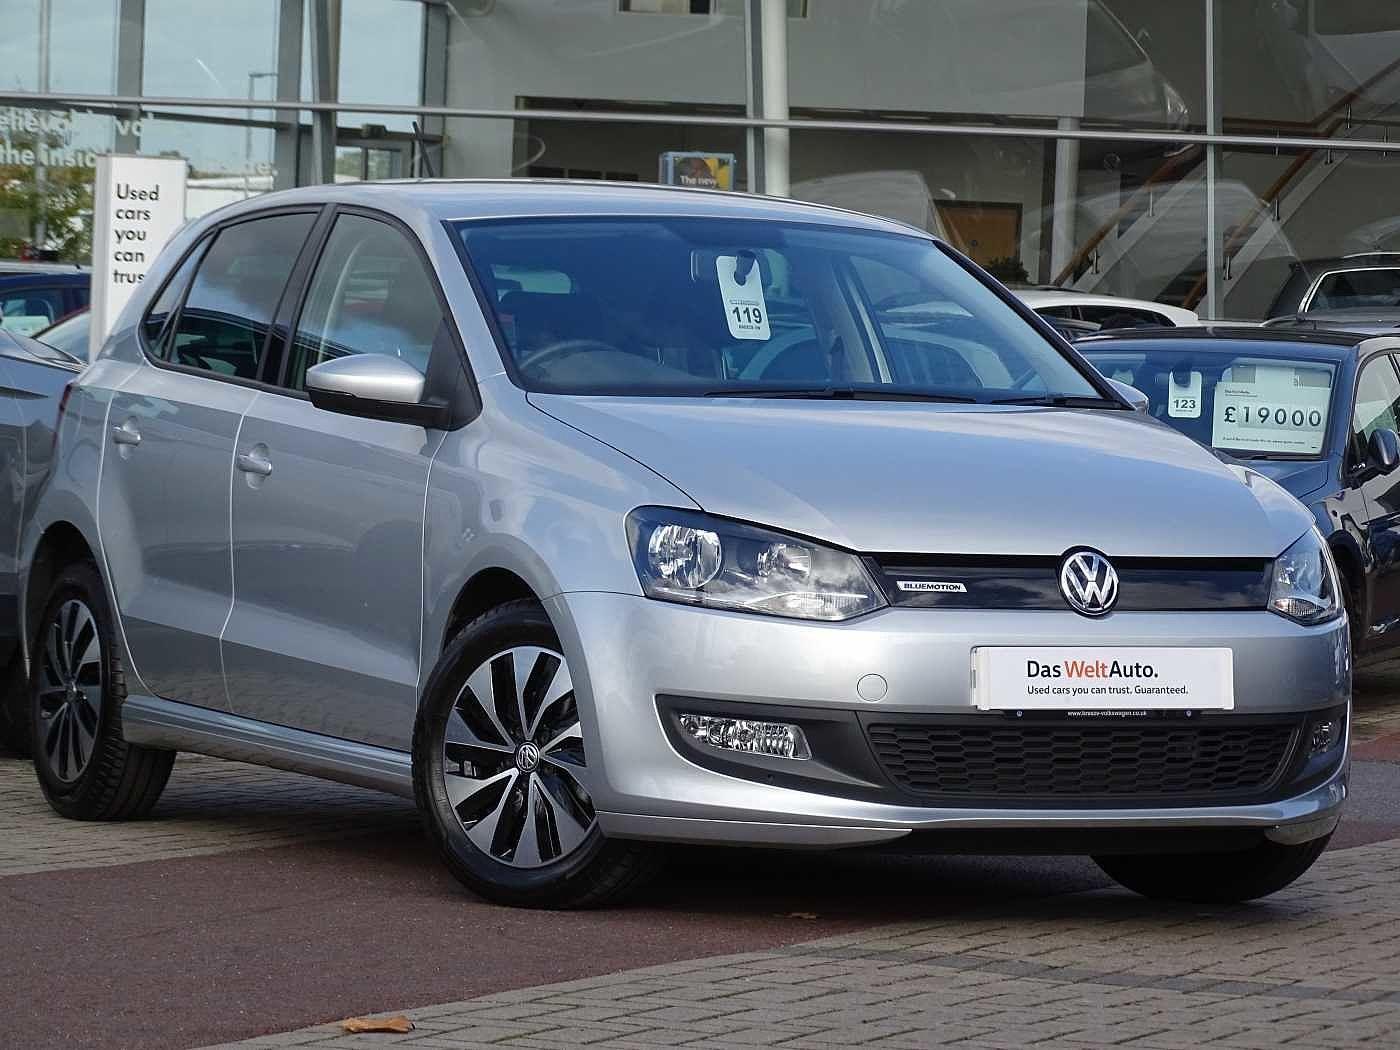 Polo 1.0 TSI (s/s) (95 PS) 5-Dr | Bournemouth & Poole | Breeze VW